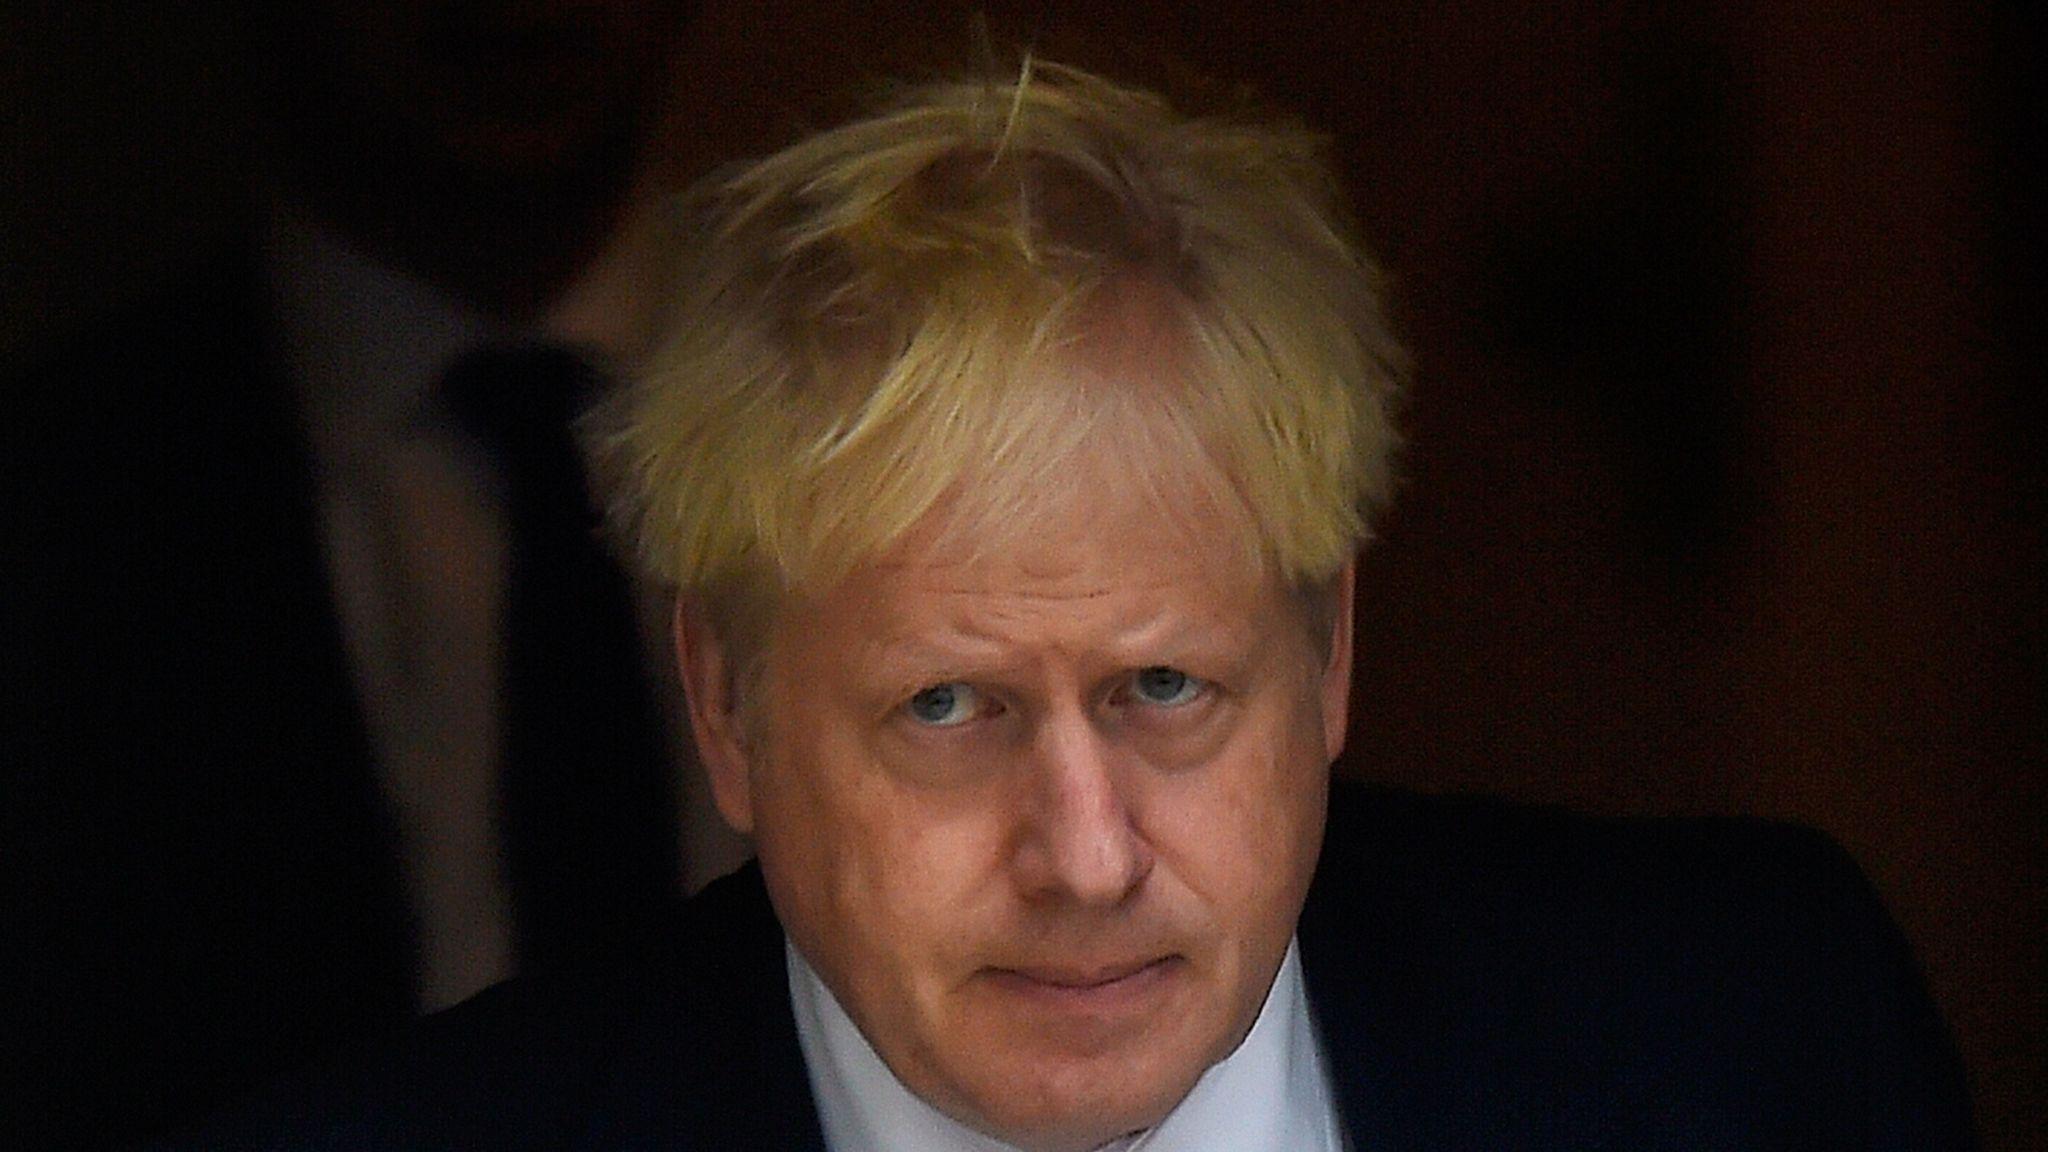 Brexit: Boris Johnson in final rallying call as rebels plot last-minute hurdle